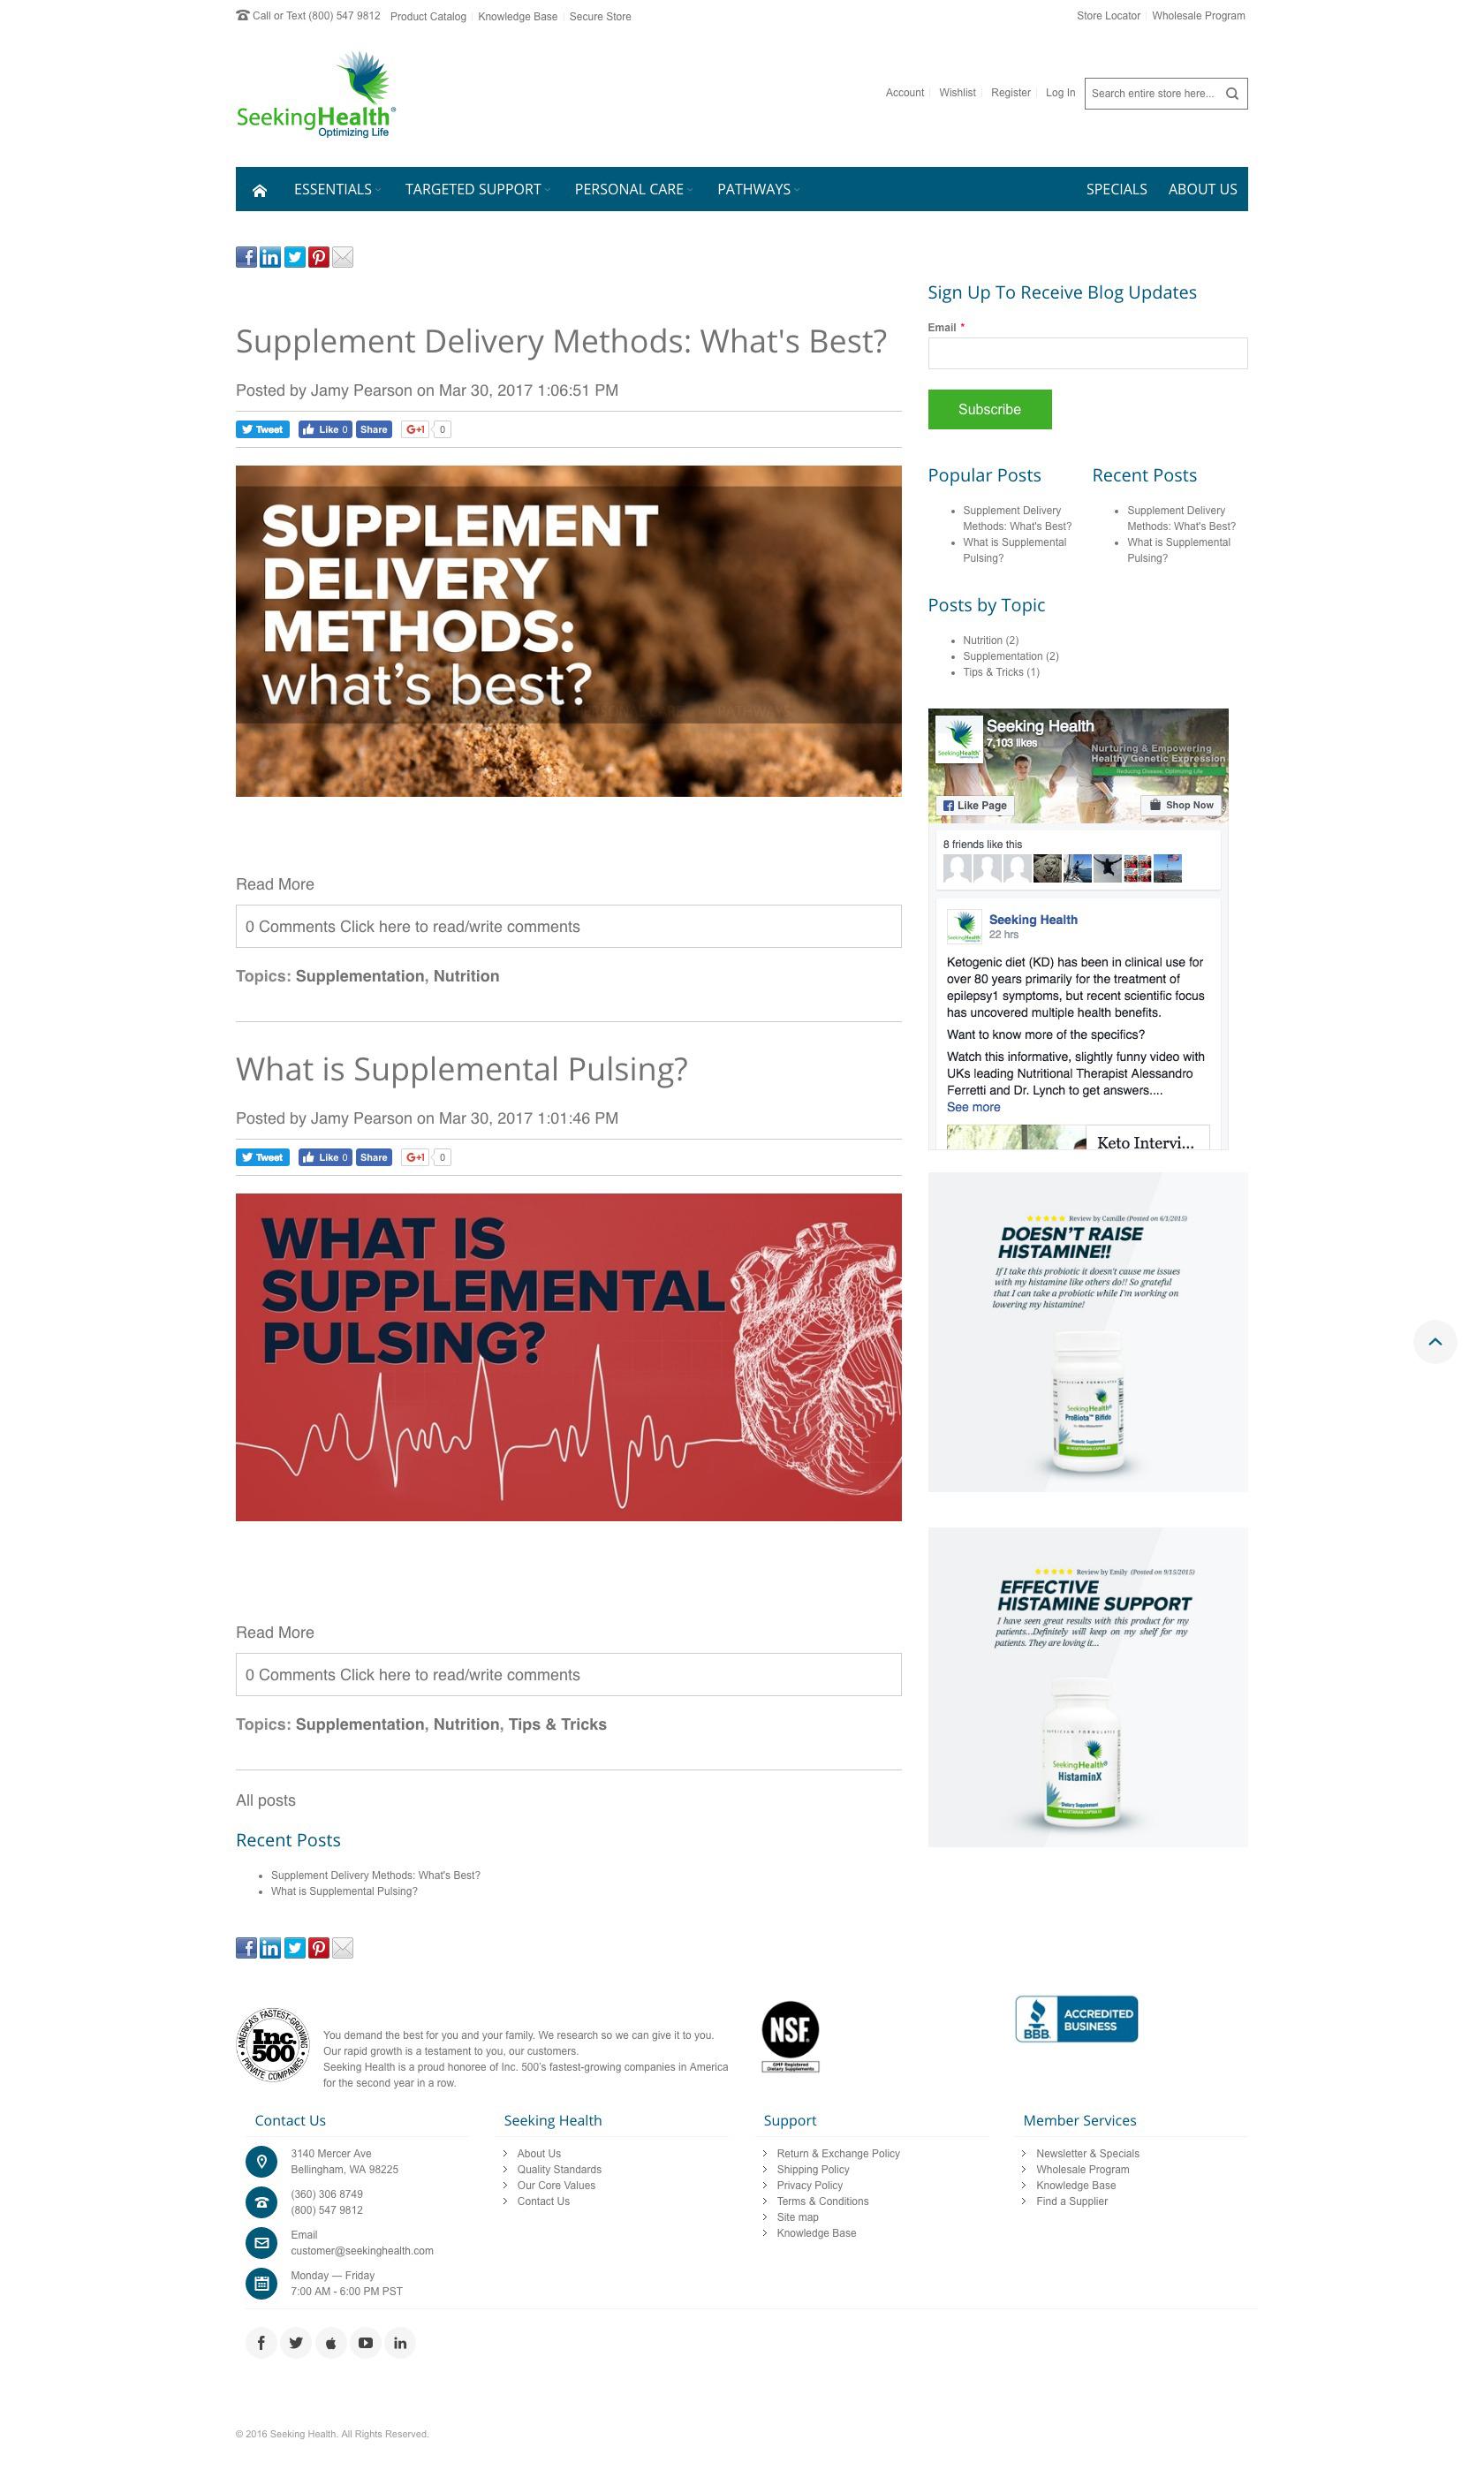 seeking-health-marketing-blog